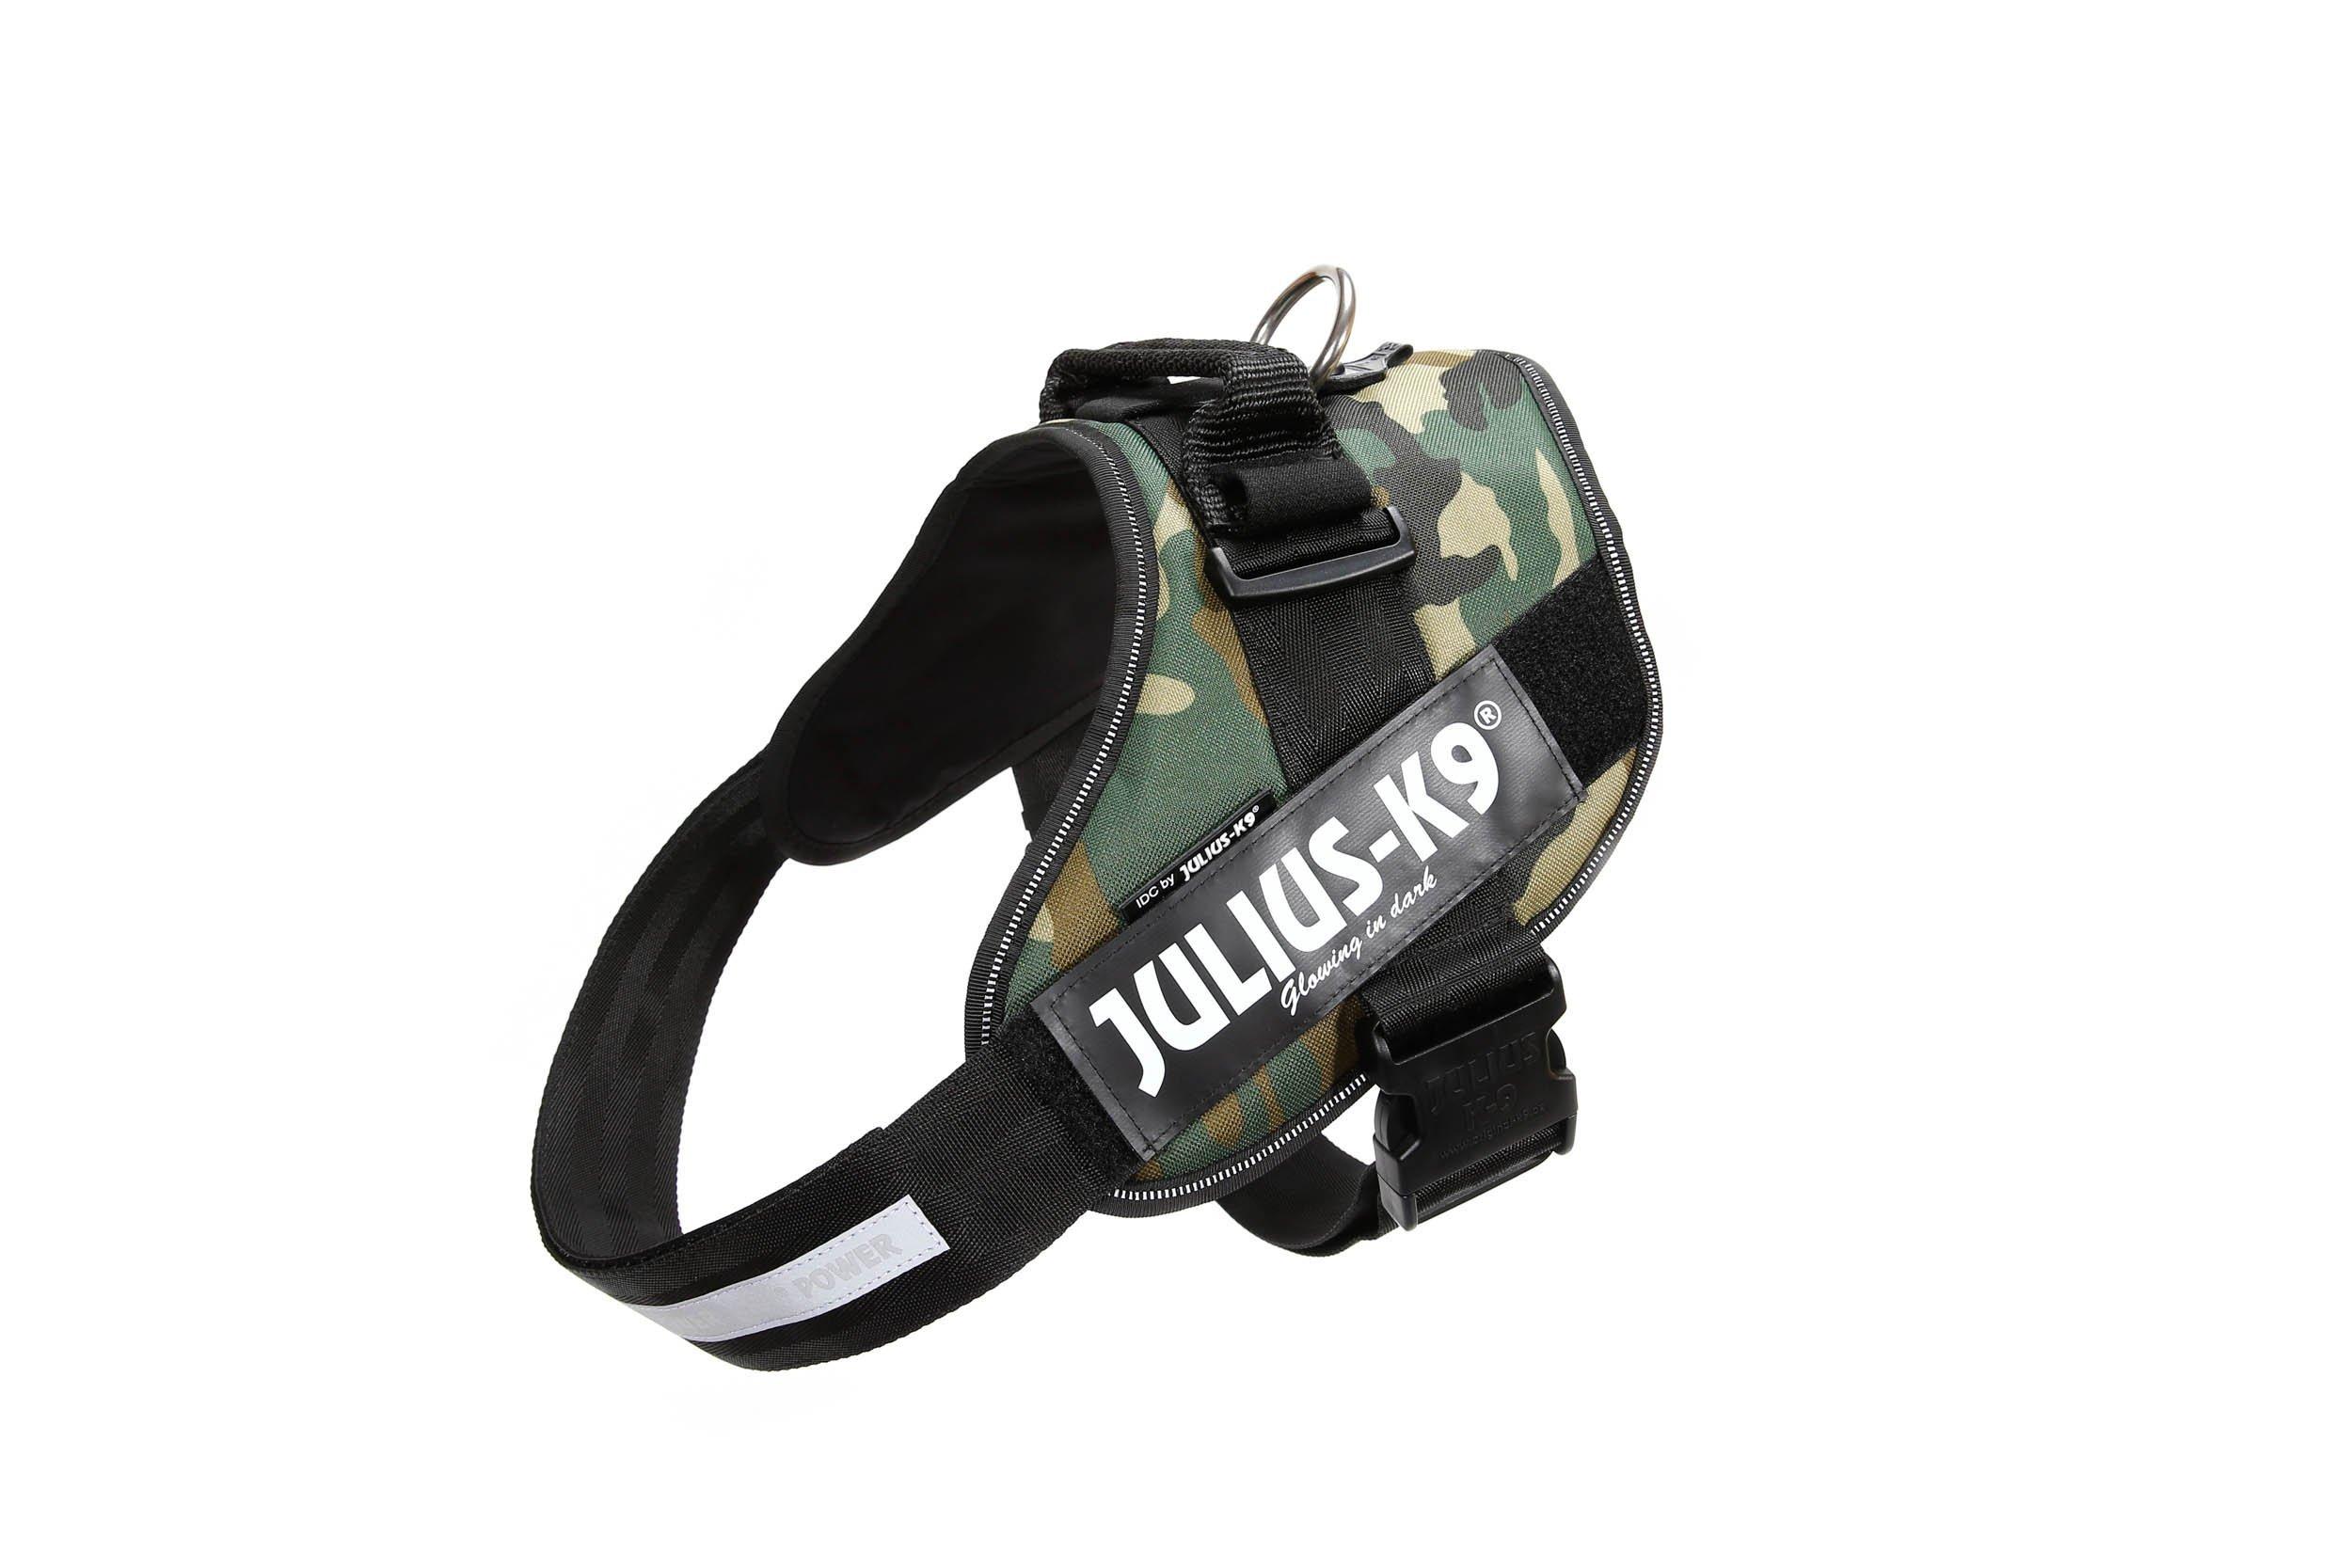 Julius-K9 16IDC-C-2 IDC Power Harness, Size: 2 (71-96cm/28-37.5''), Camouflage